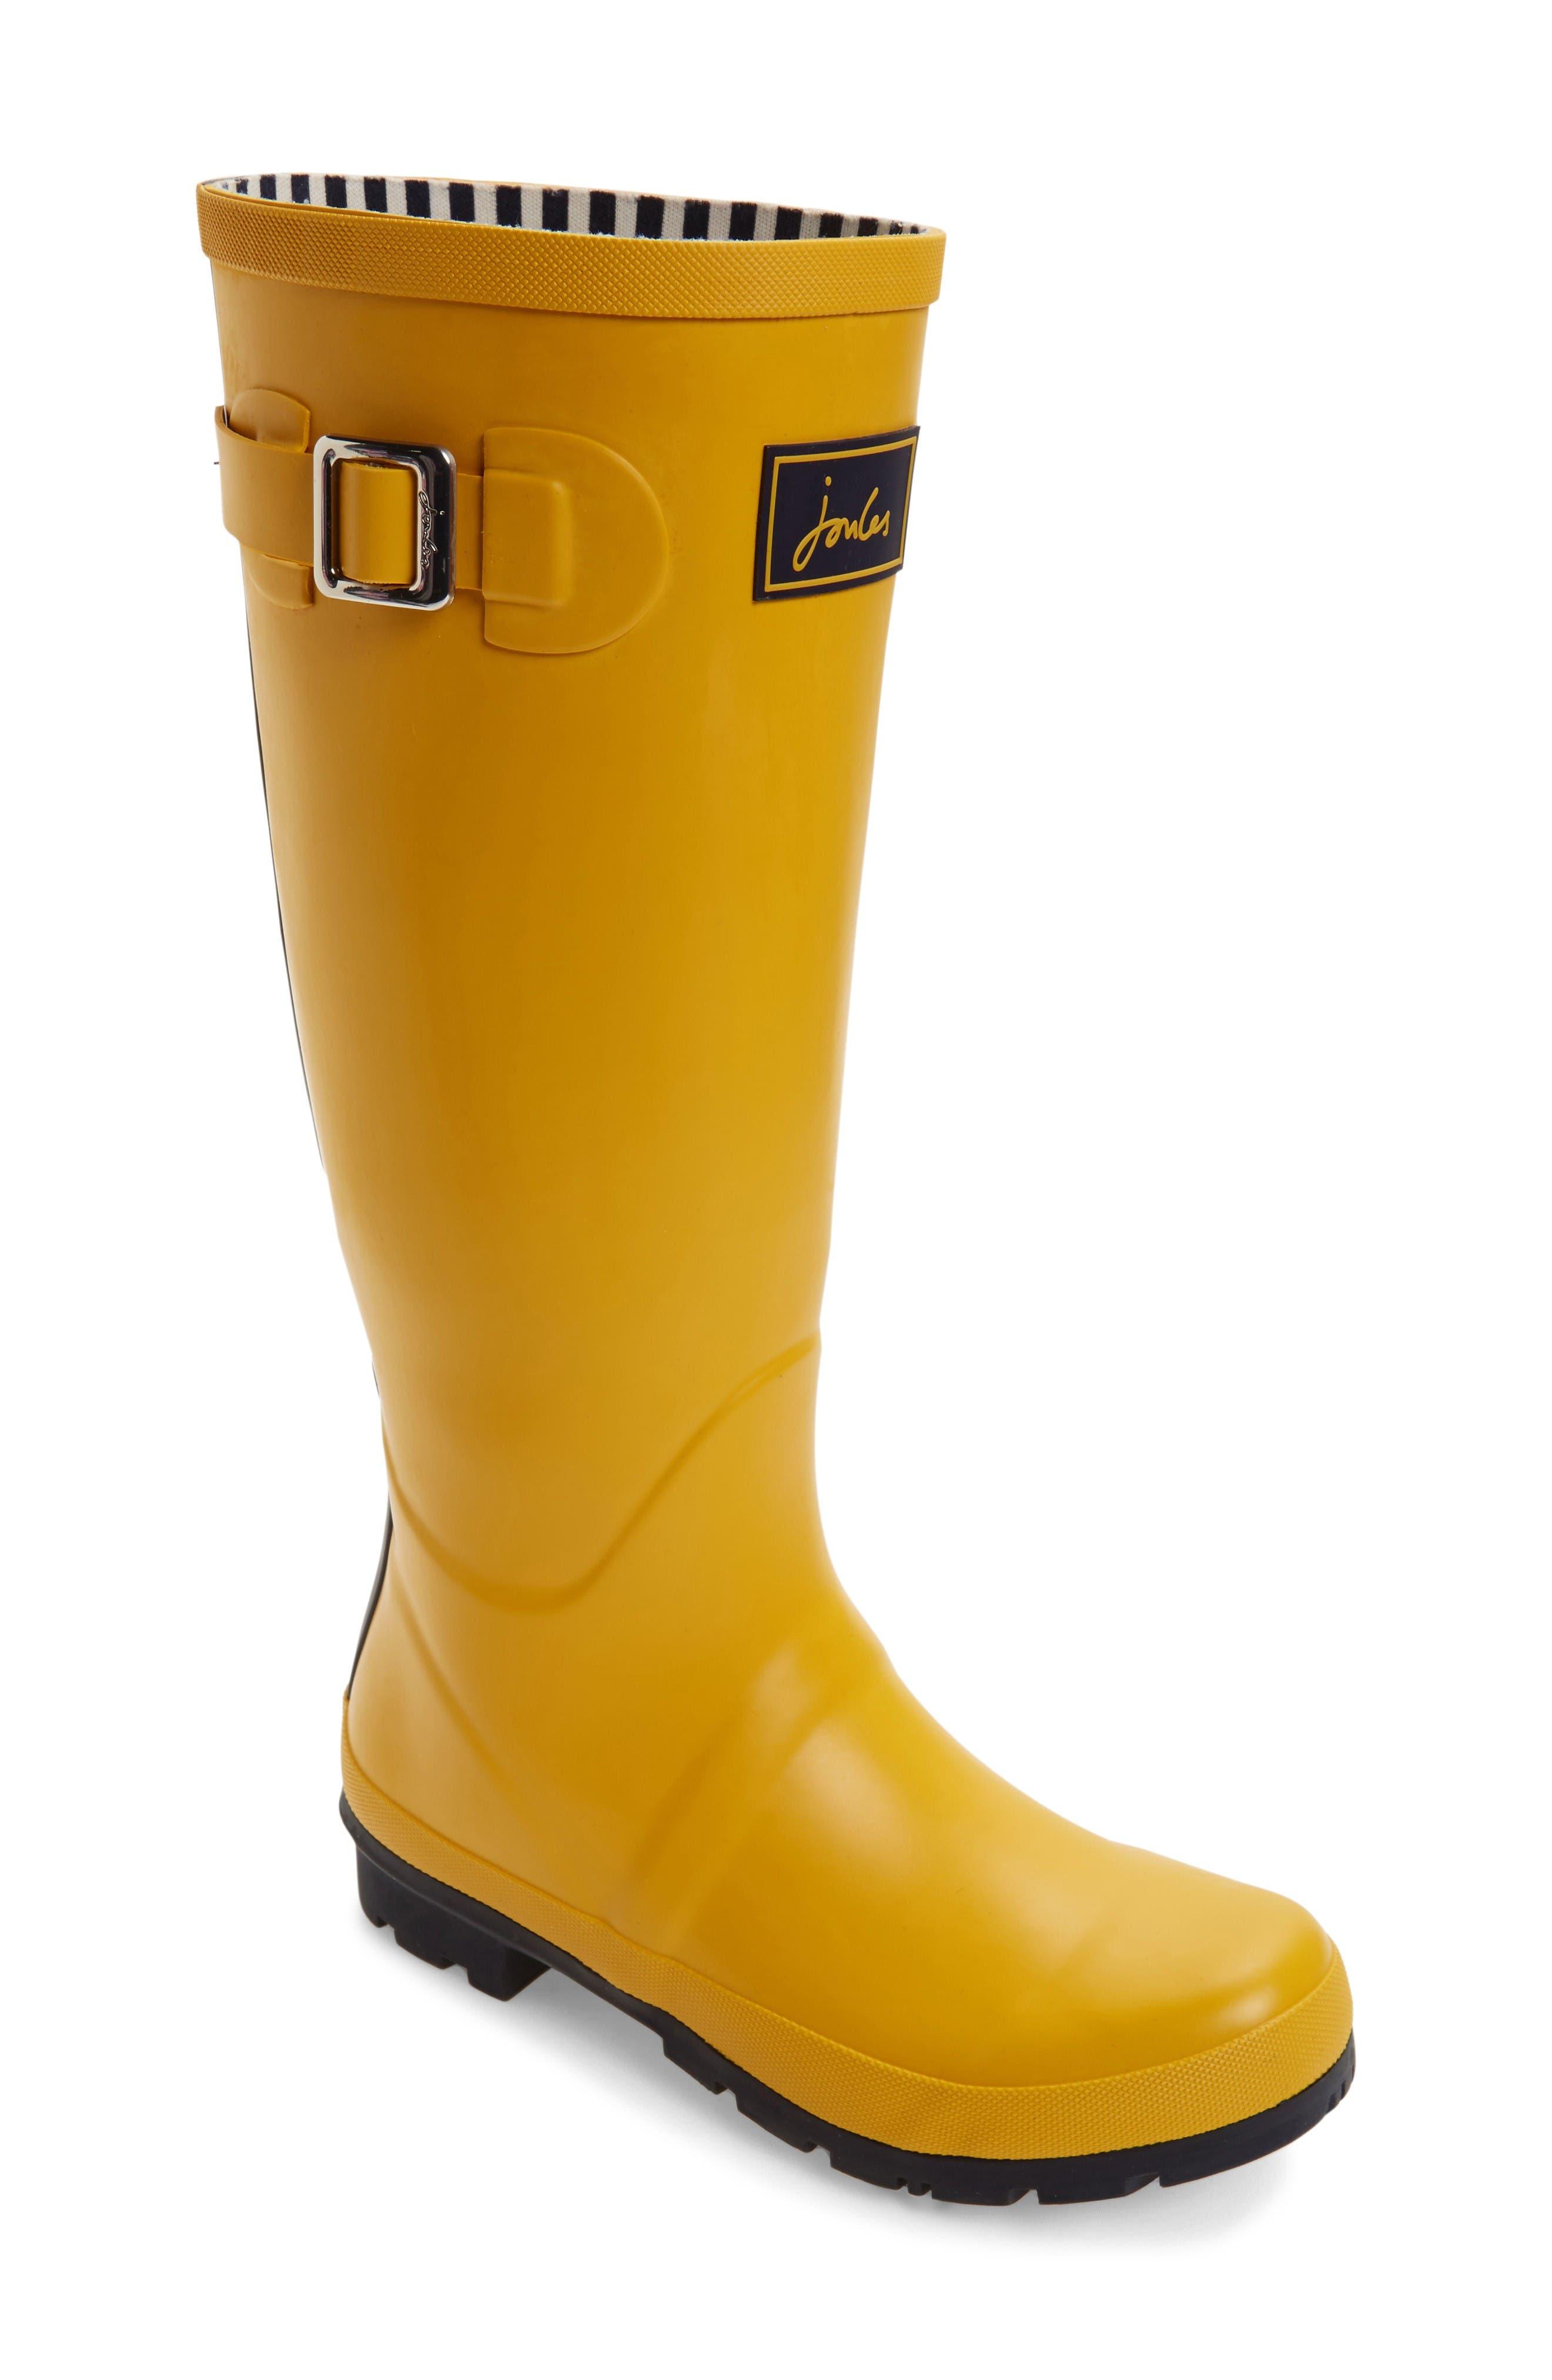 Main Image - Joules 'Field Welly' Rain Boot (Women)